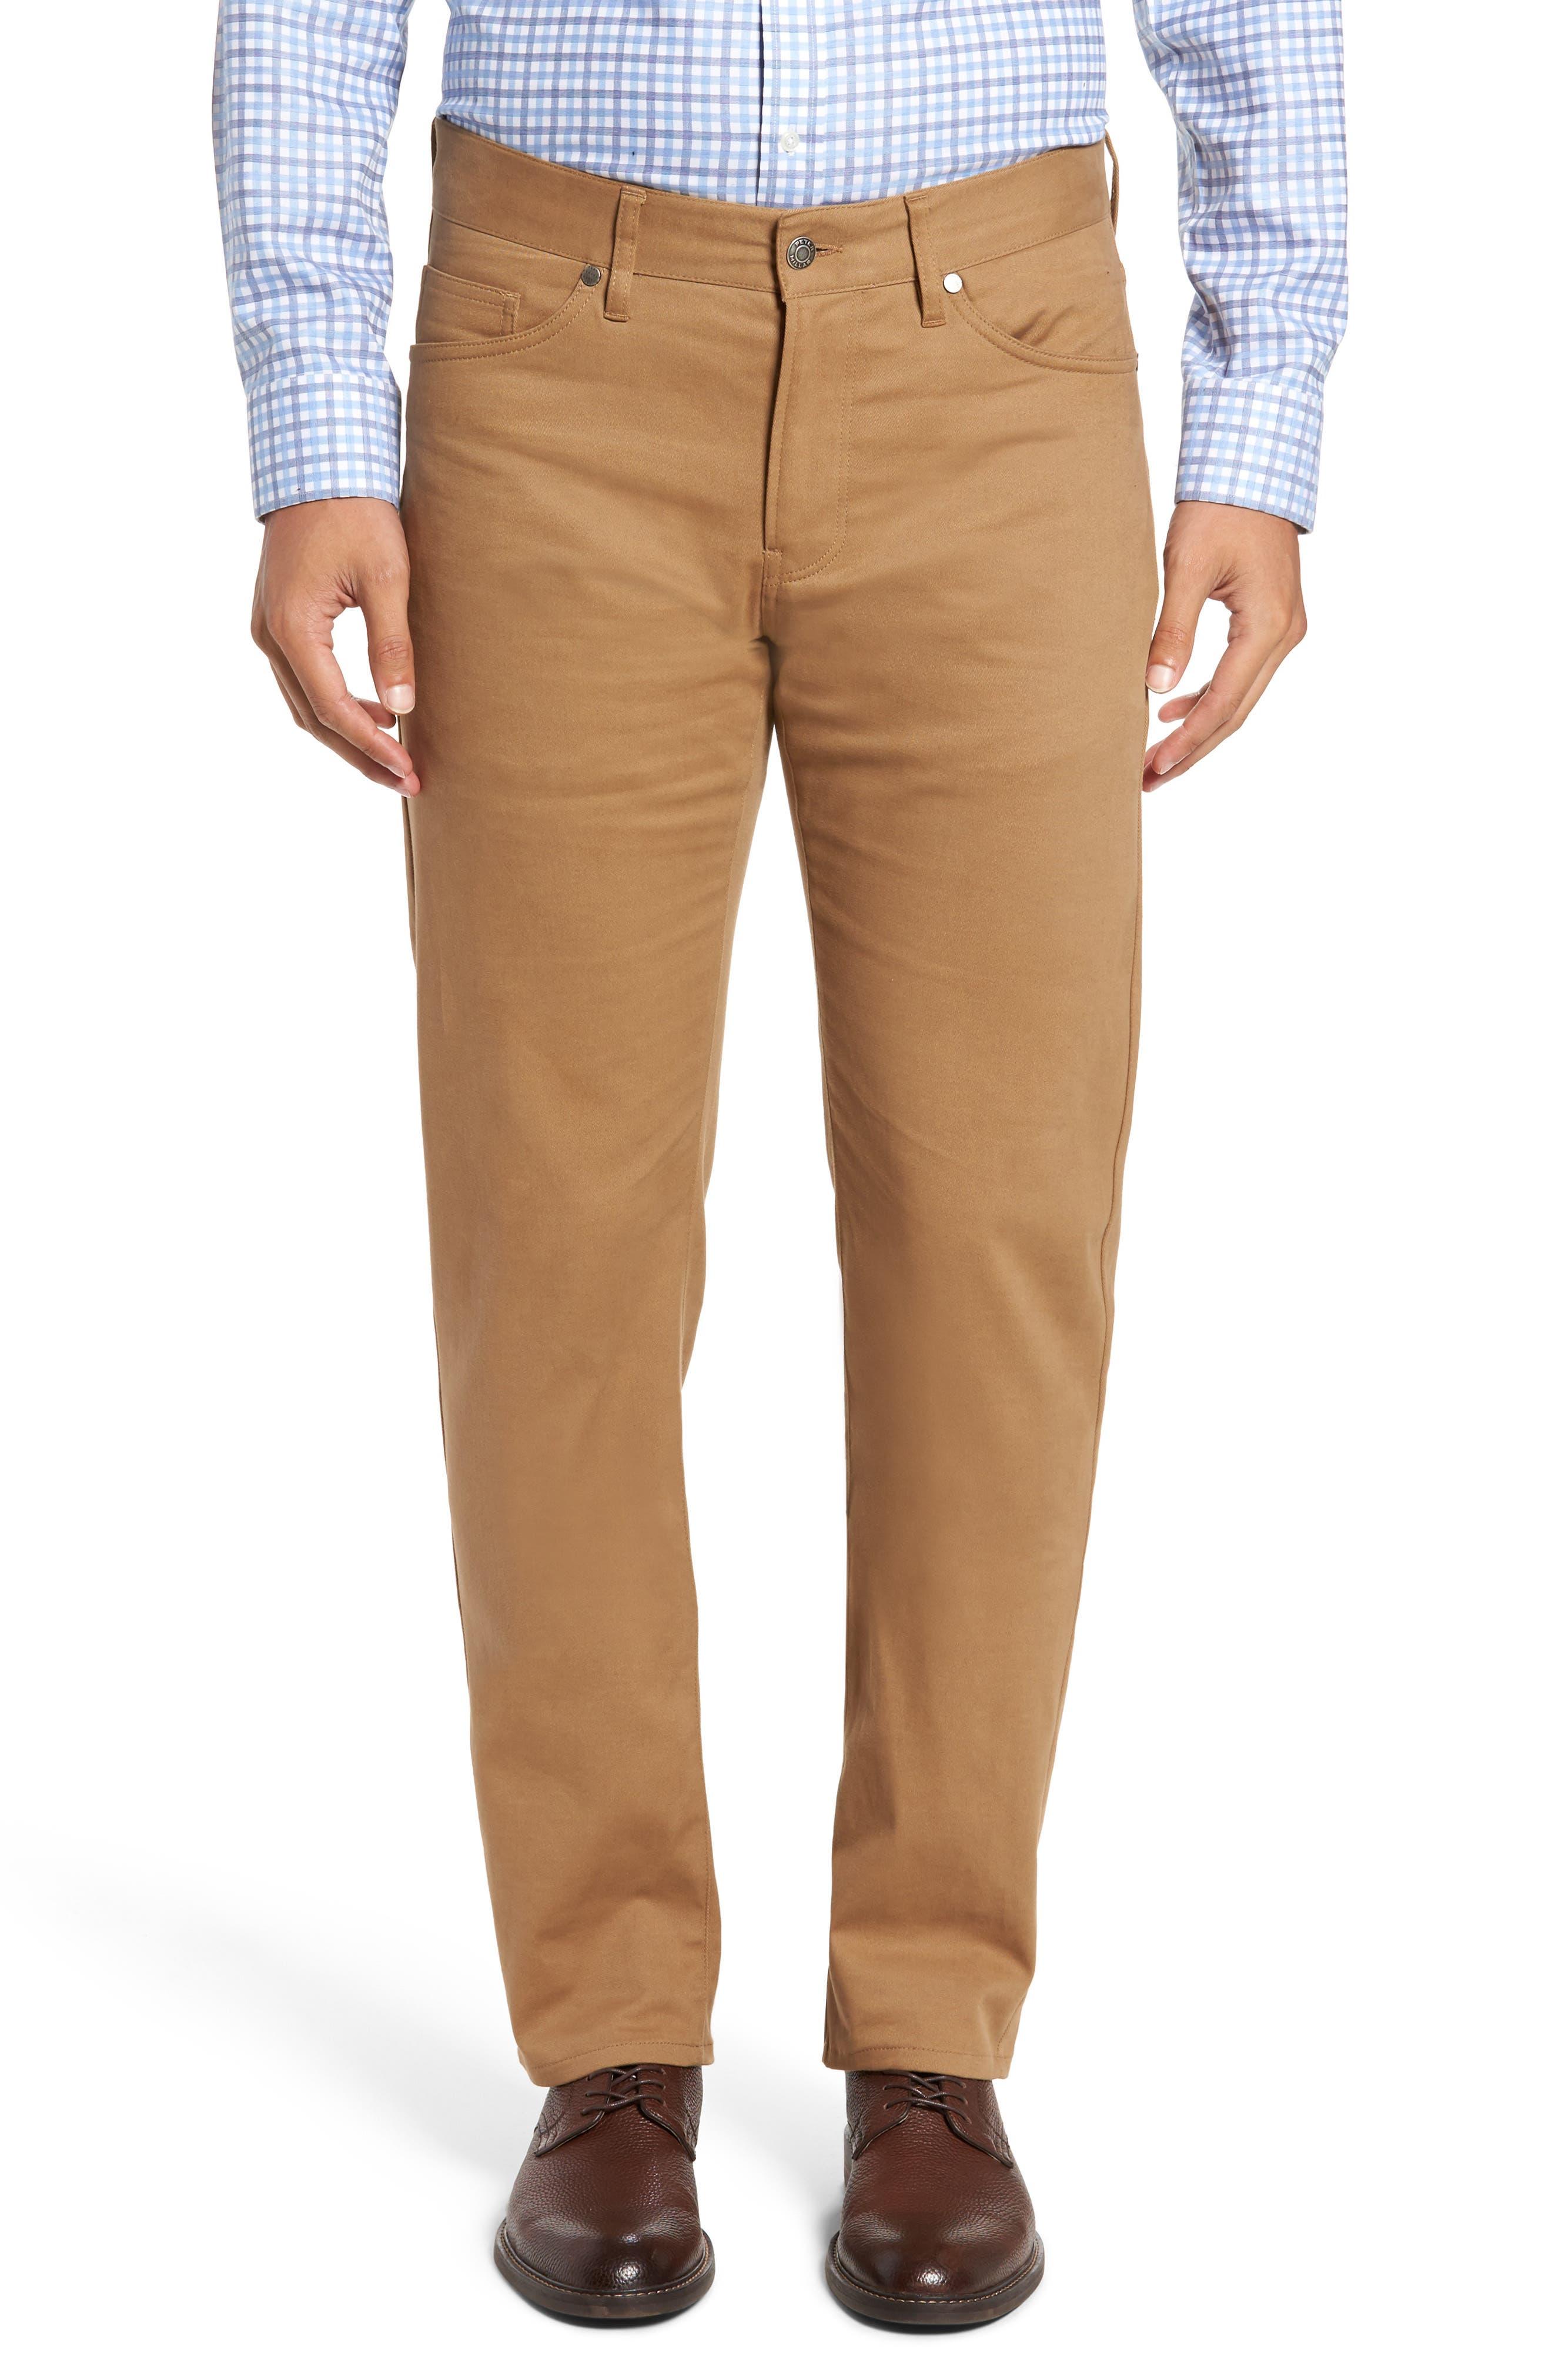 Alternate Image 1 Selected - Peter Millar Perfect Twill 5-Pocket Pants